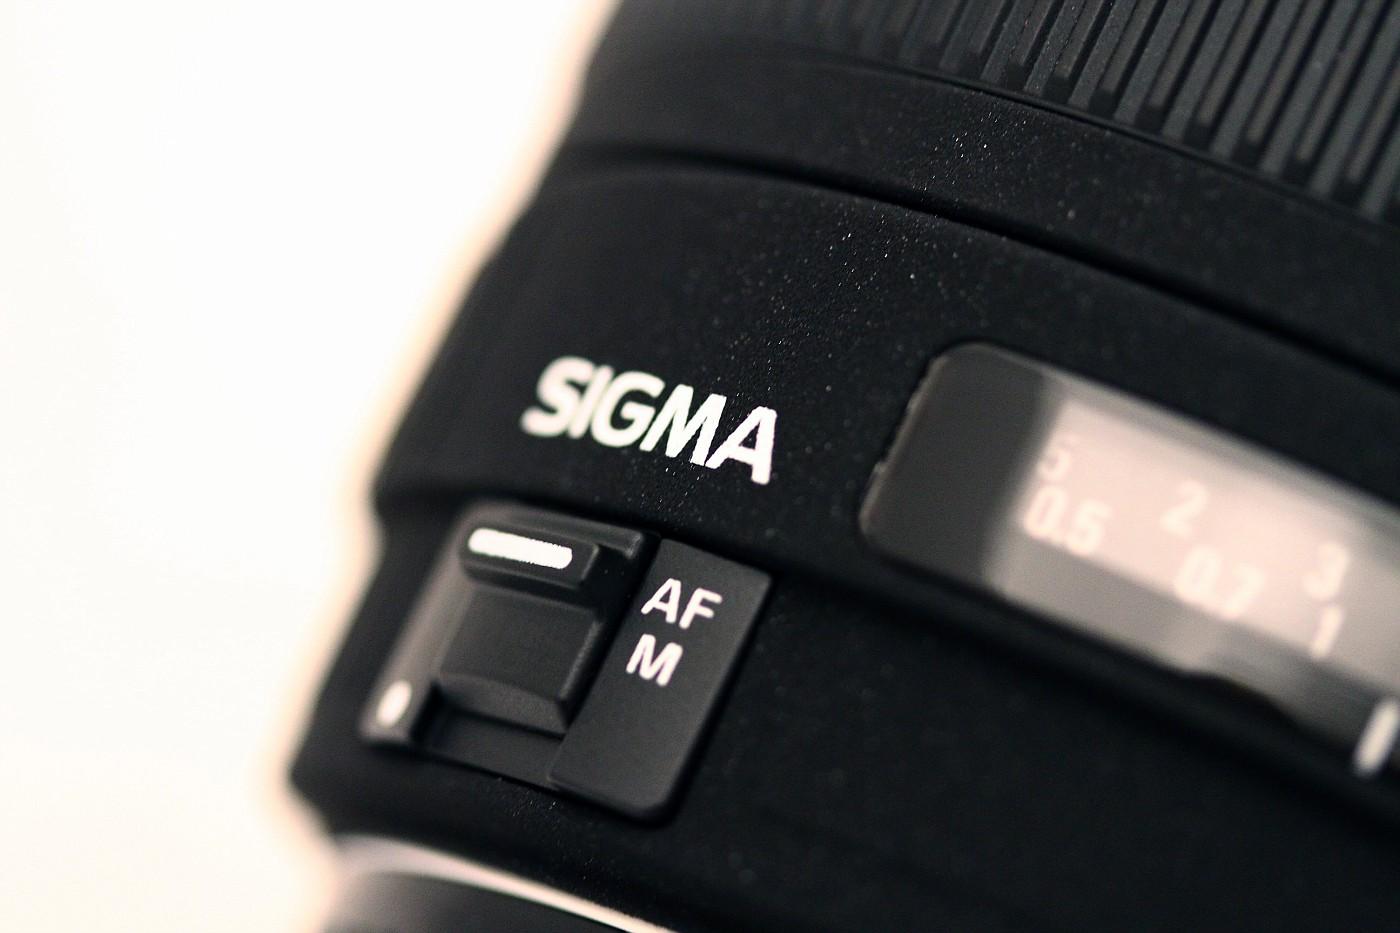 IMAGE: http://images17.fotki.com/v284/photos/2/17642/8451068/IMG_0554-vi.jpg